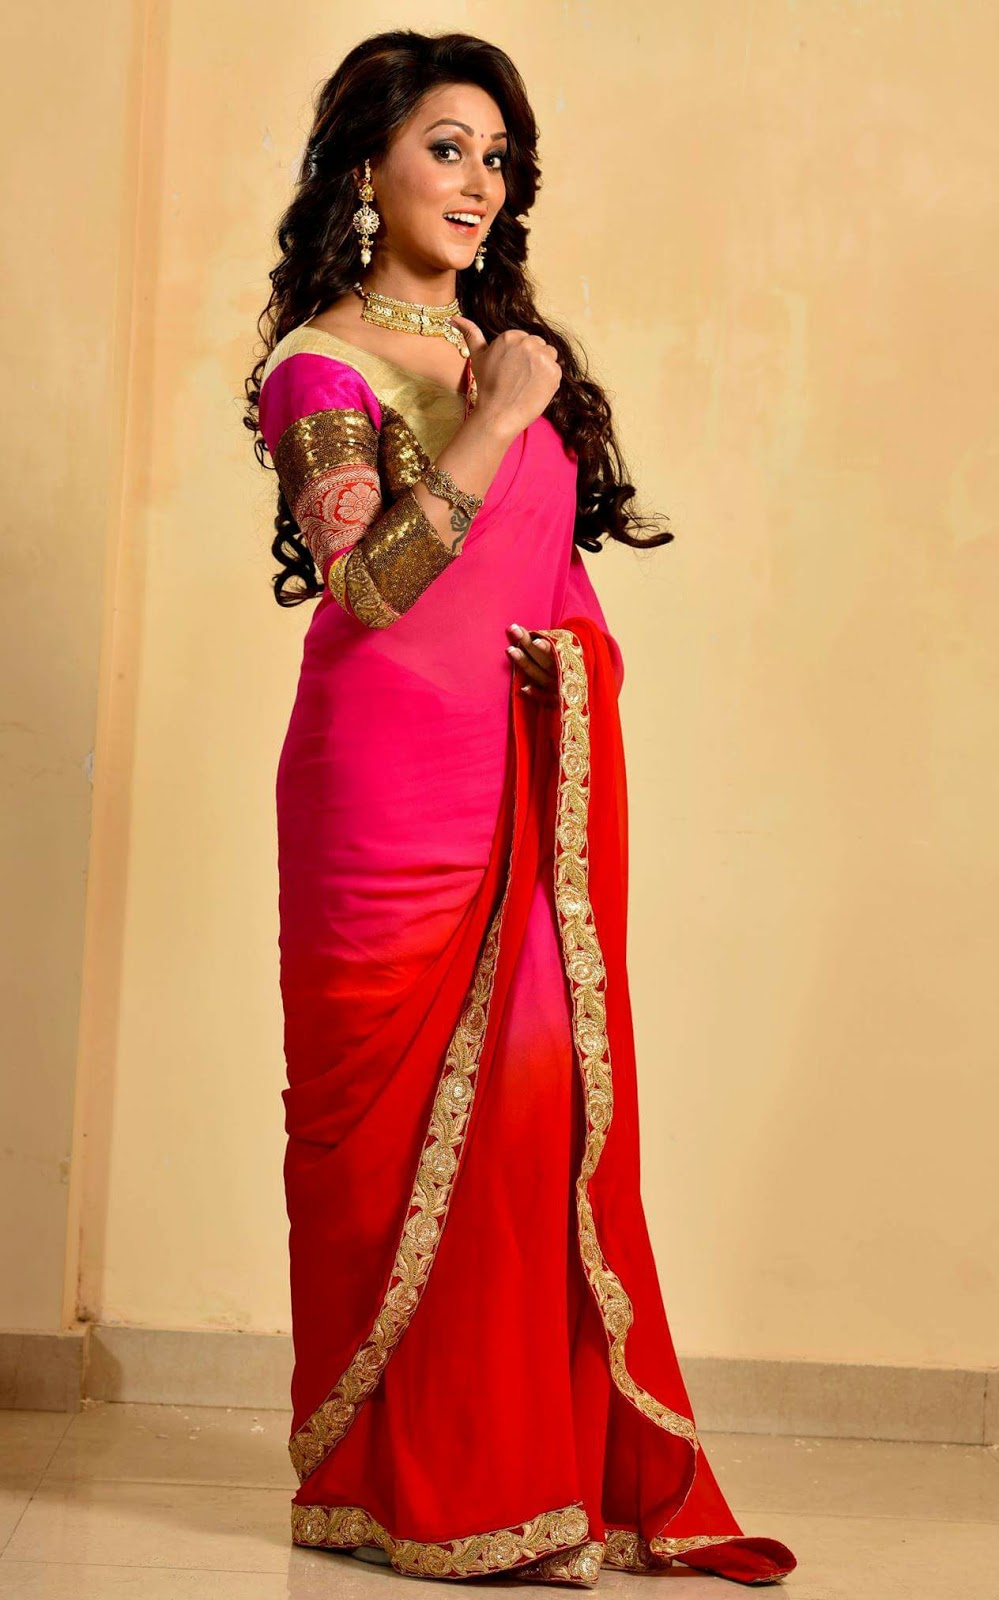 Mimi Chakraborty Best Photo Gallery - Filmnstars